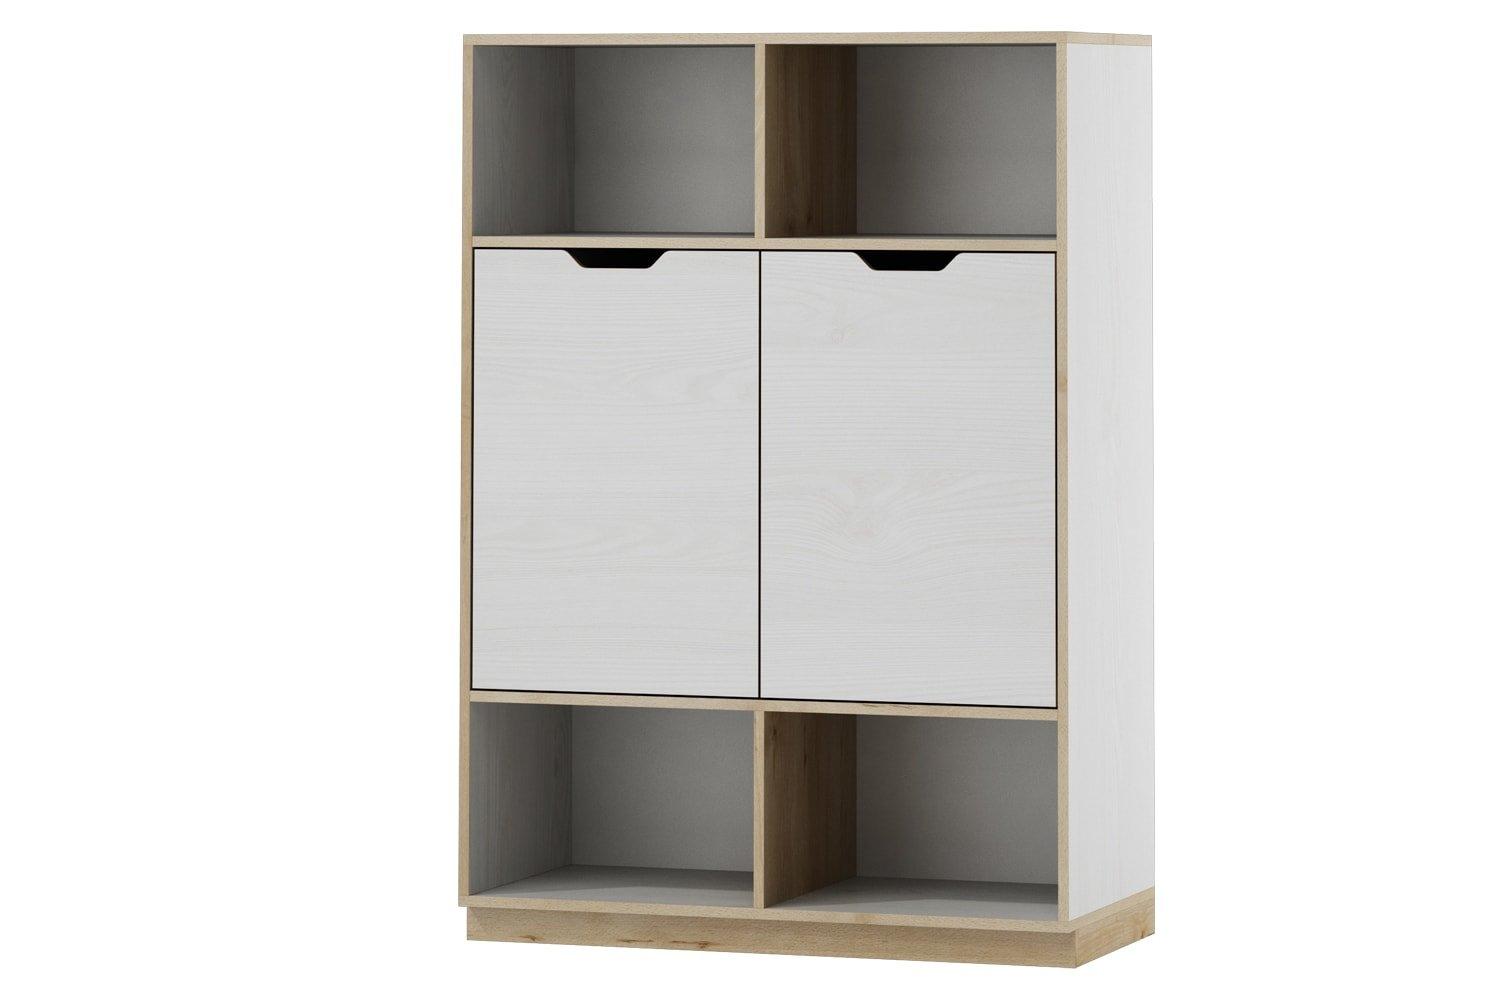 Biblioteca din pal cu 2 usi Medium Happy 11 White / Beech , l89xA41xH126 cm imagine